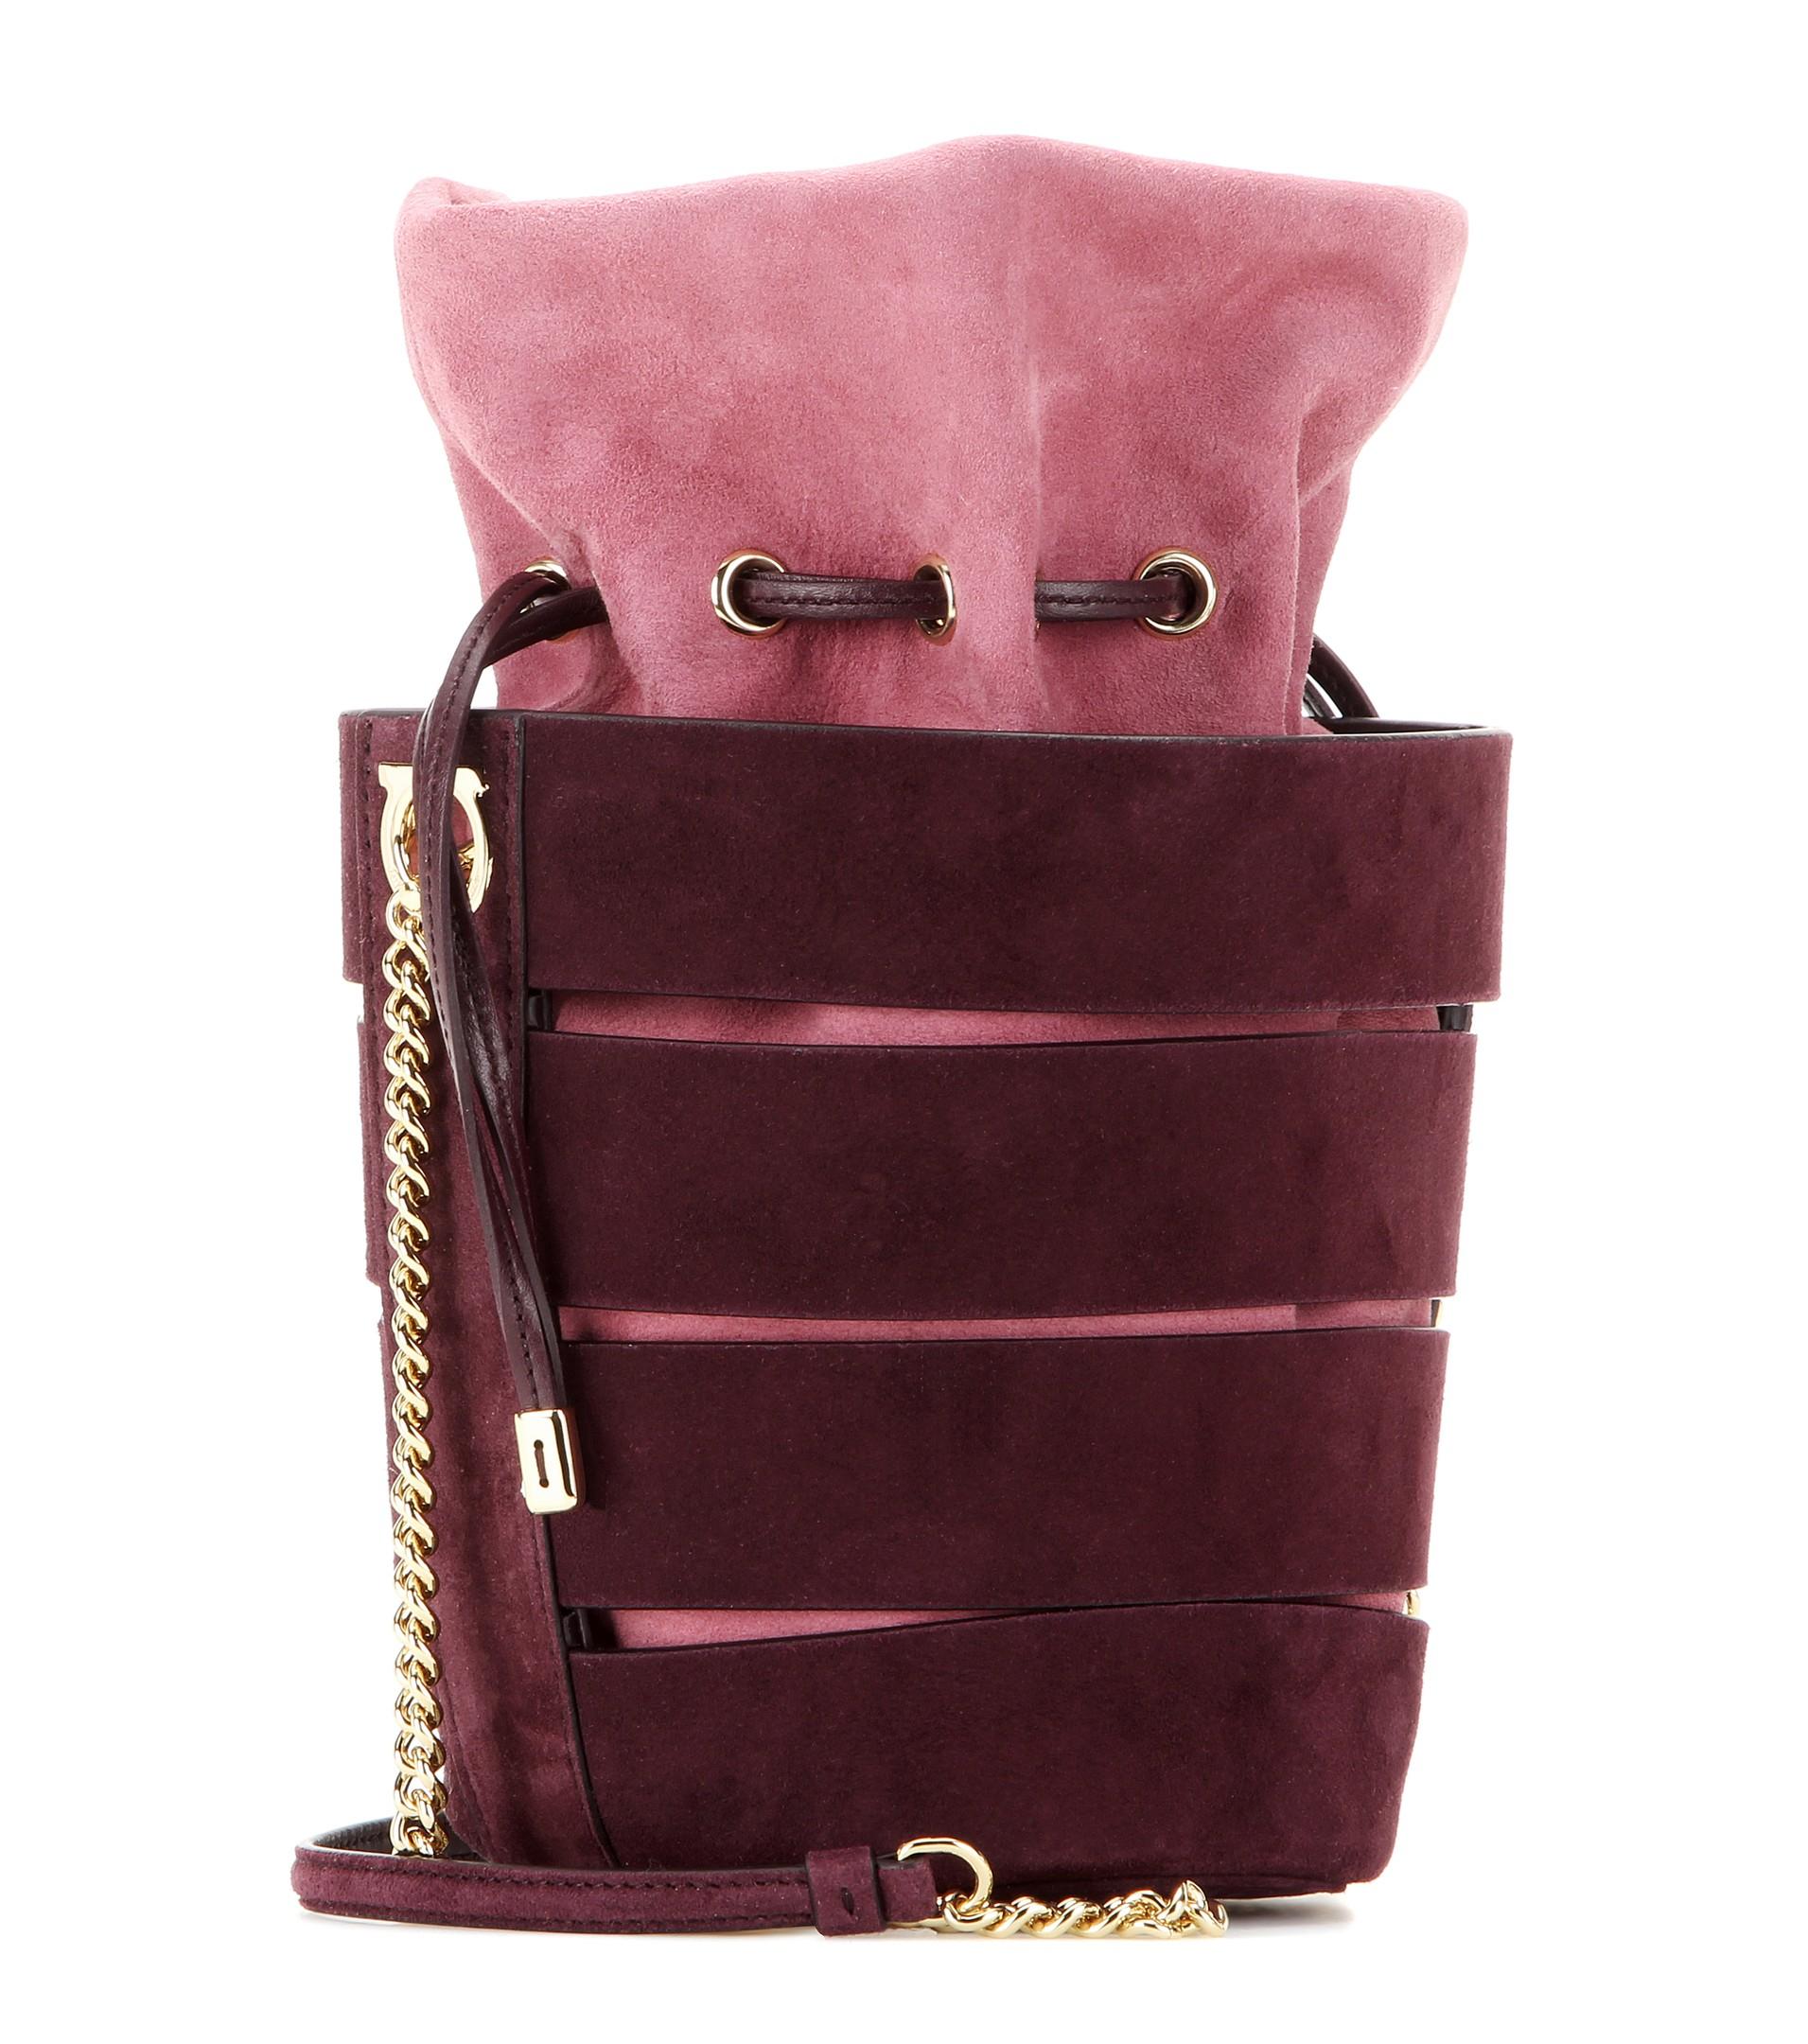 8843ed0d39 Lyst - Ferragamo Mini Bucket Suede Shoulder Bag in Purple